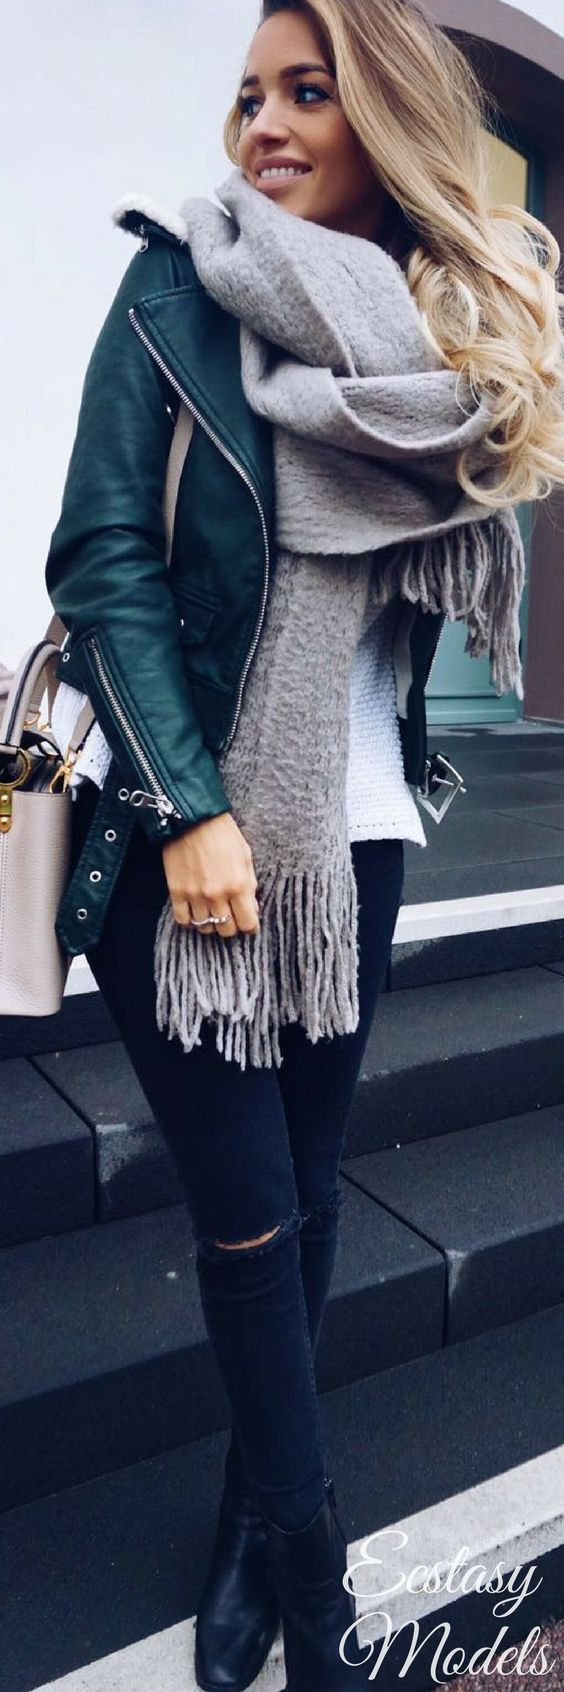 зимни комбинации дрехи